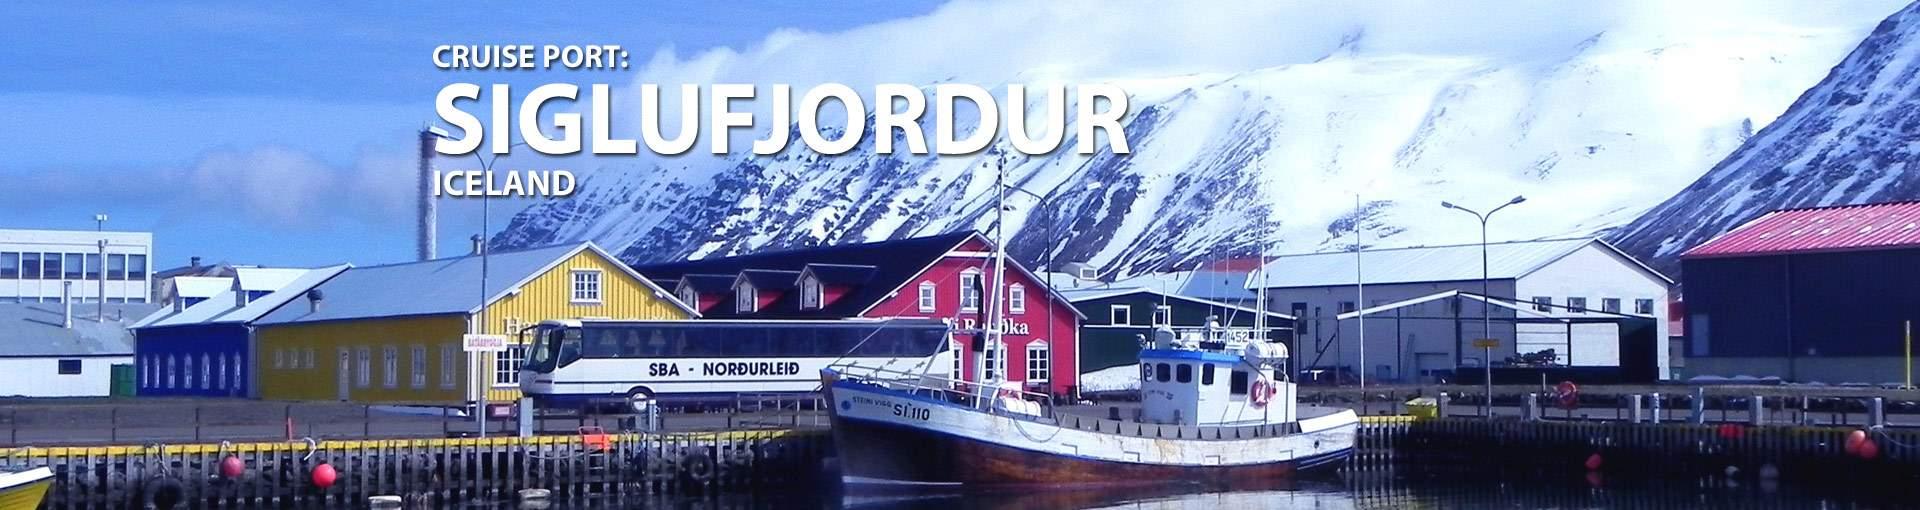 Siglufjordur, Iceland Cruise Port